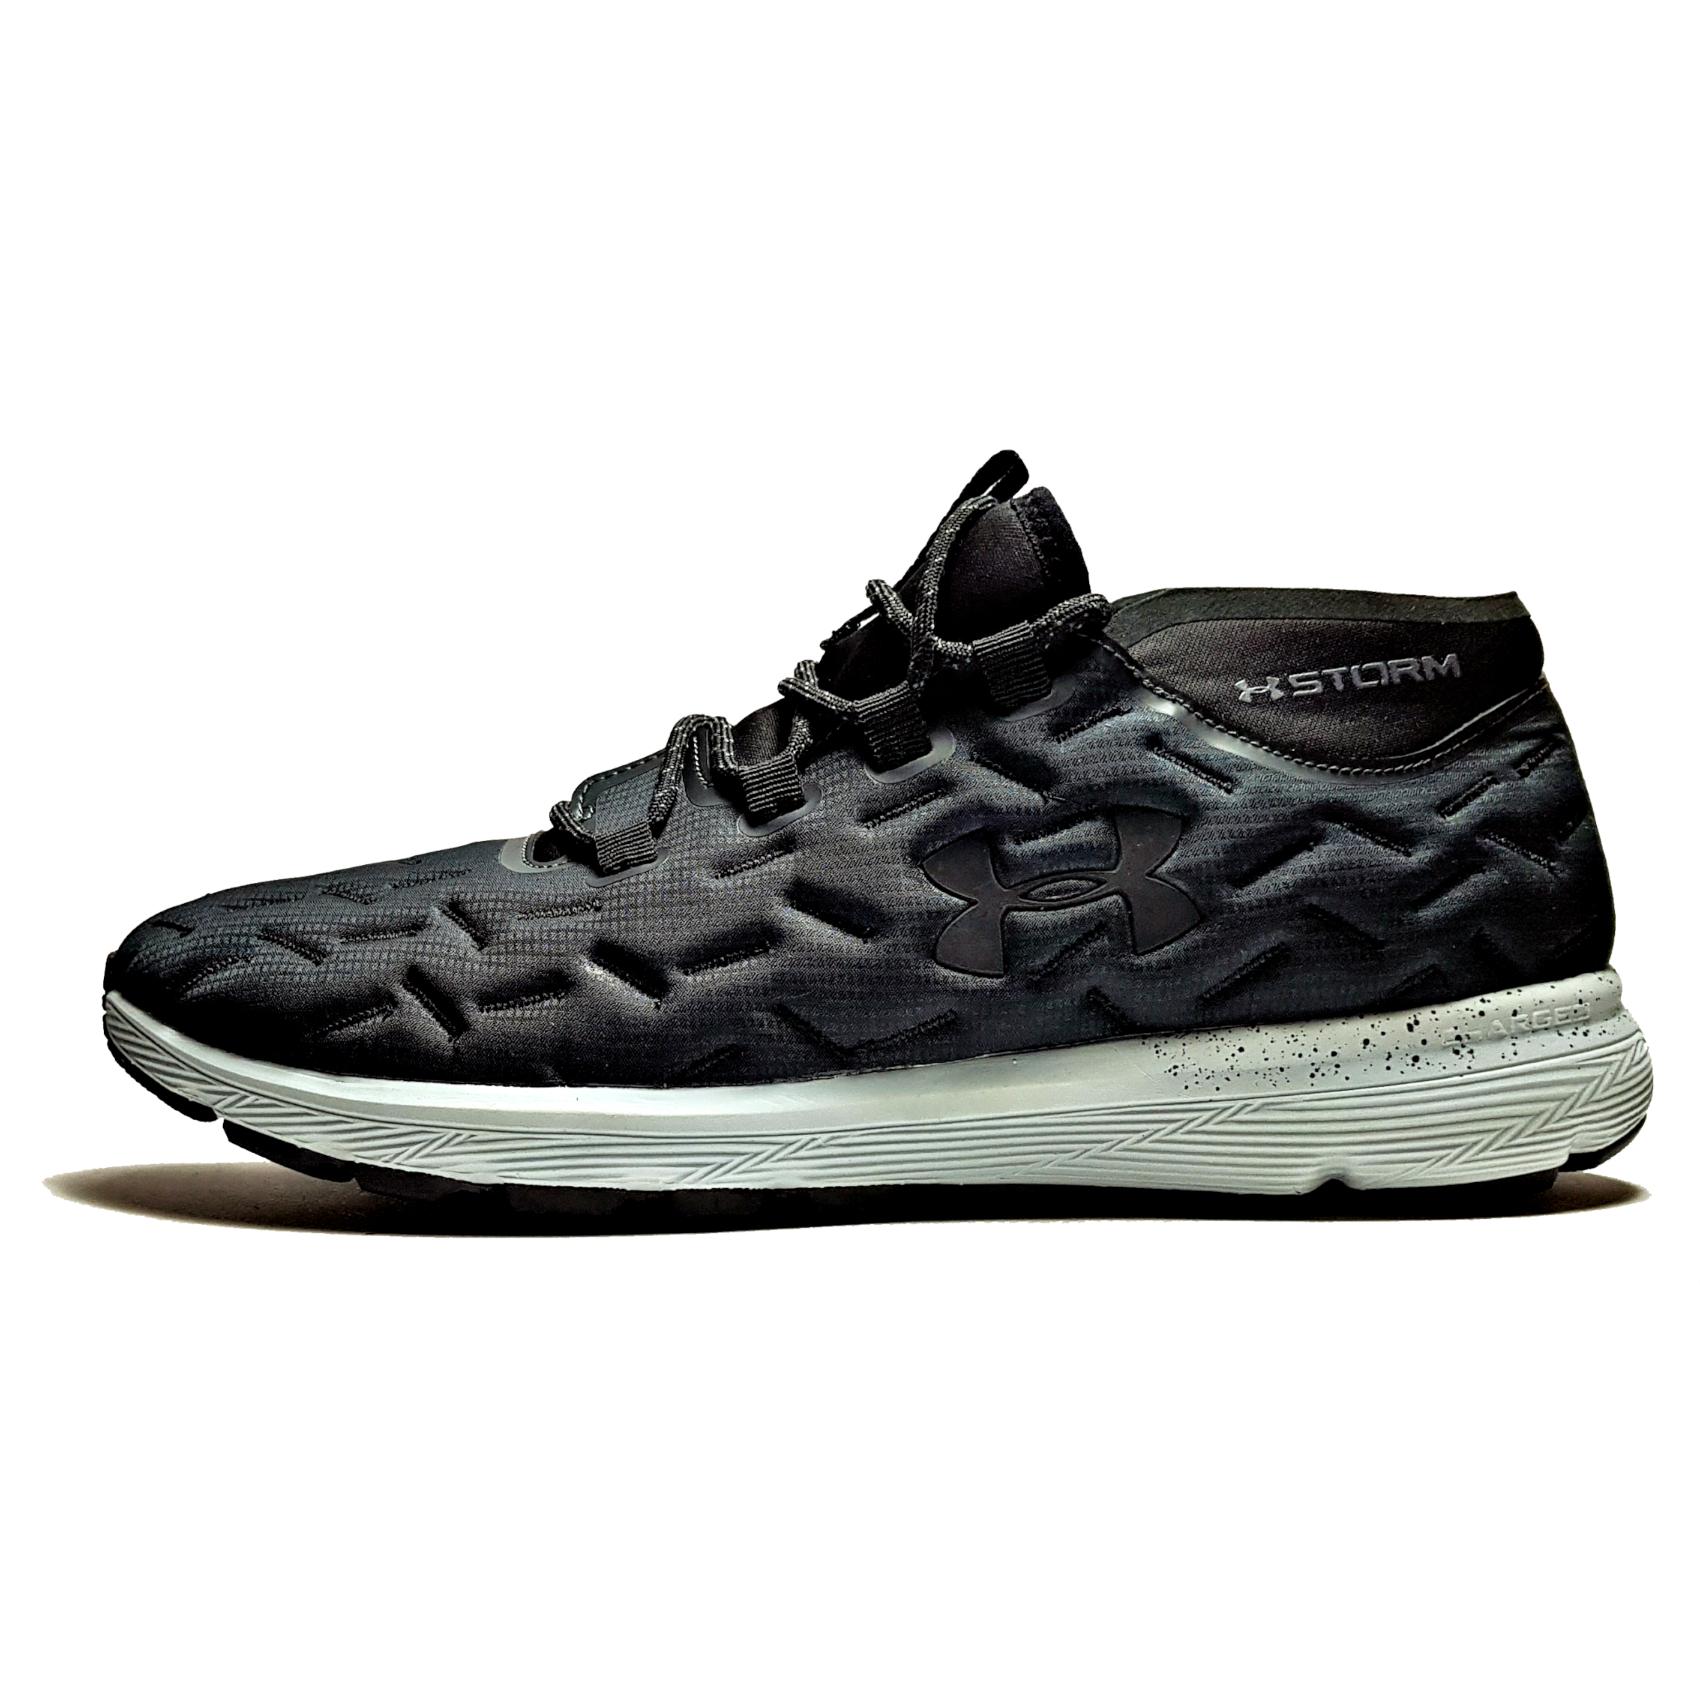 کفش مخصوص دویدن مردانه آندرآرمور مدل Charged Reactor Run